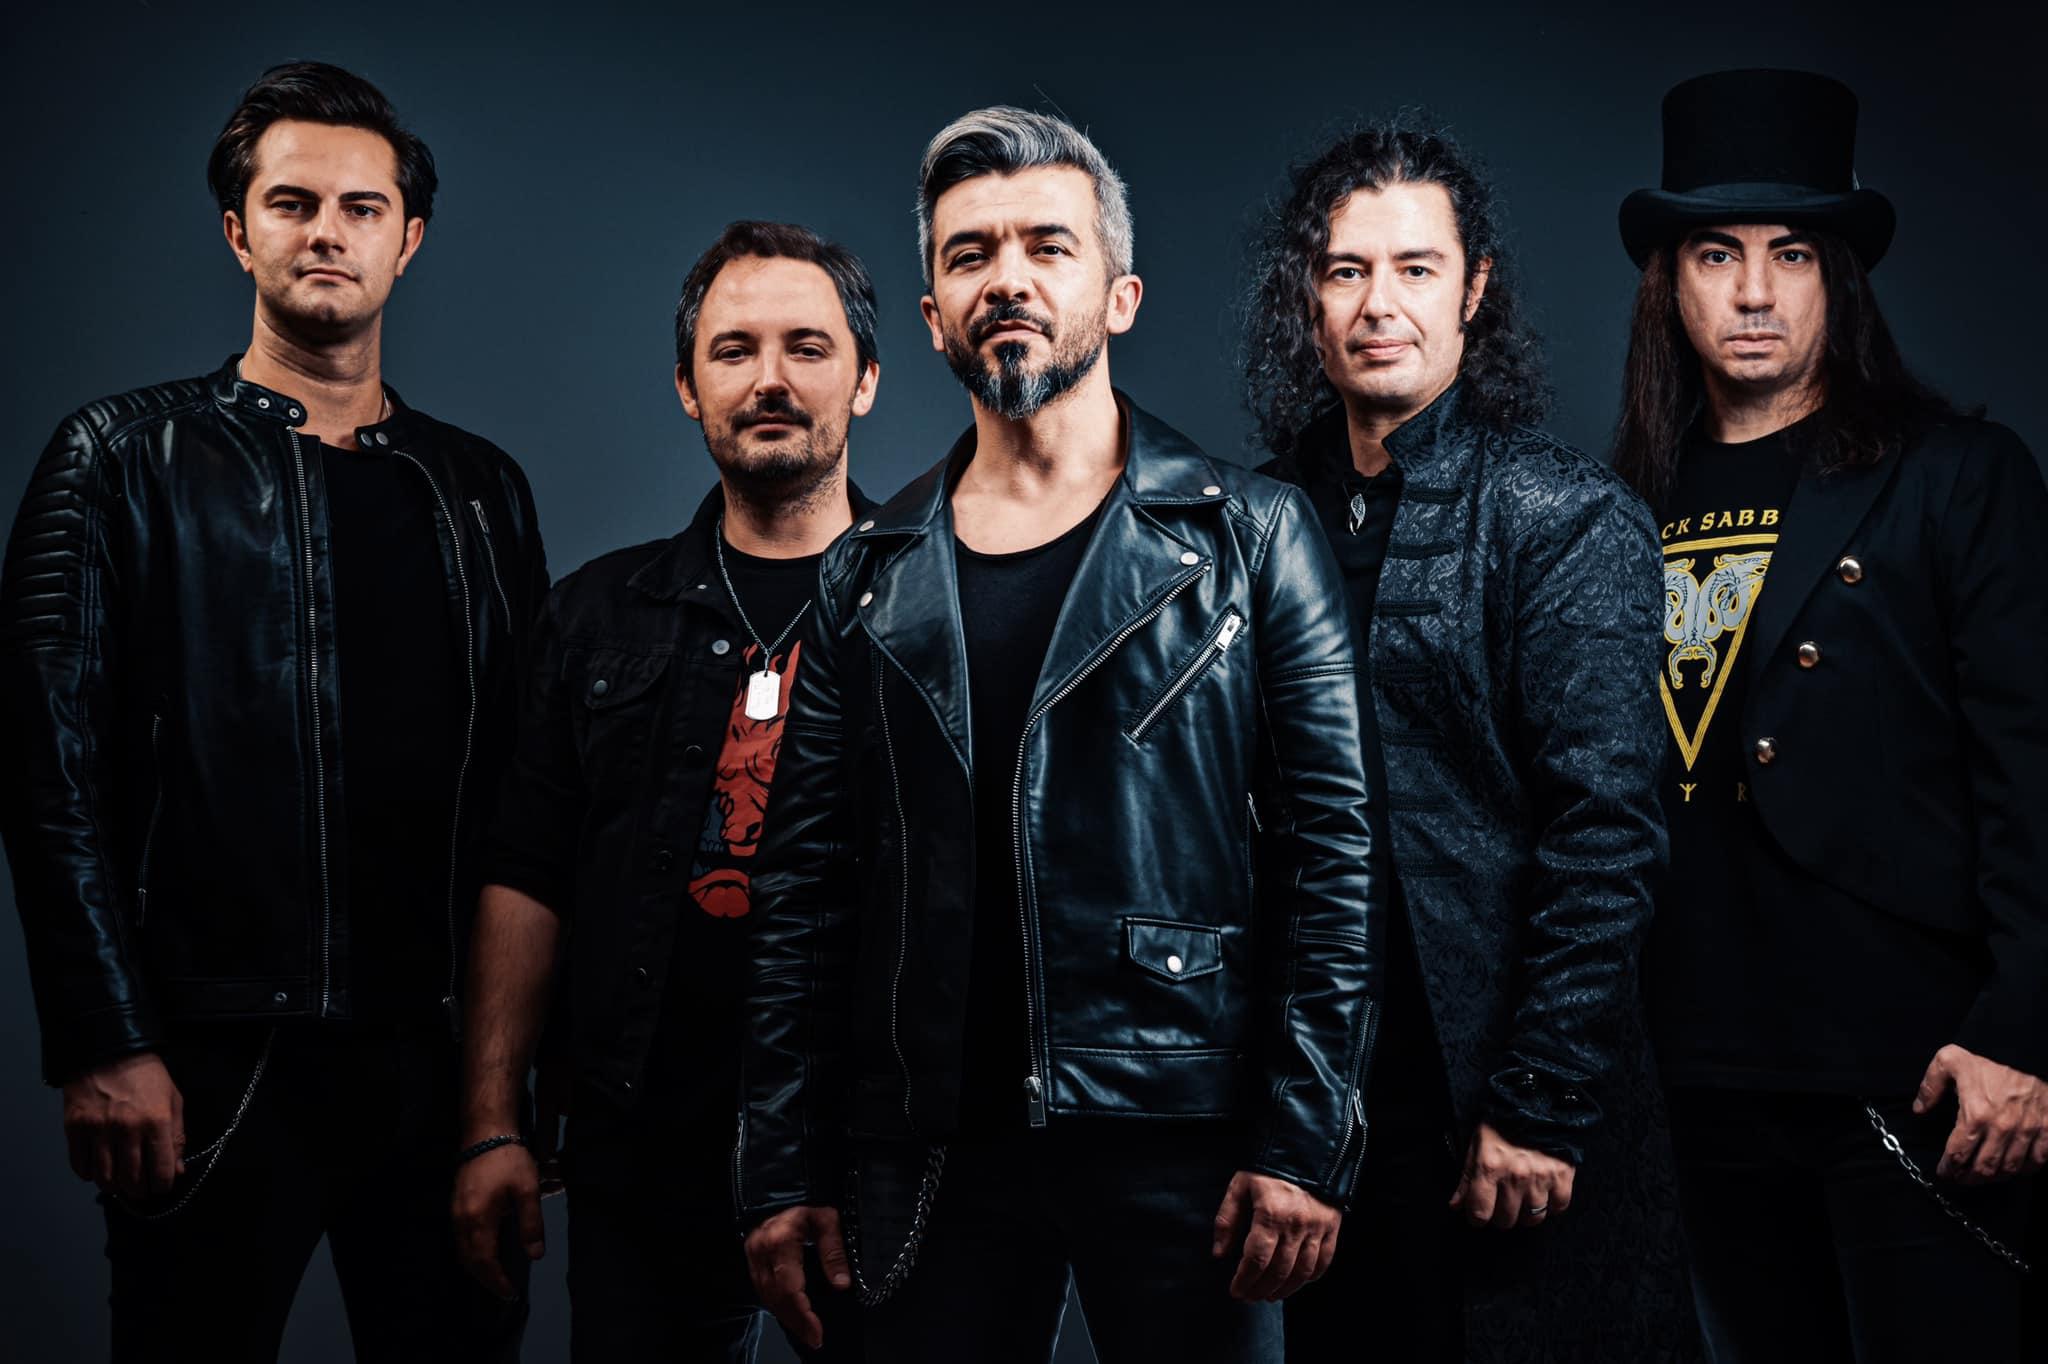 Saints 'n' Sinners - Photo